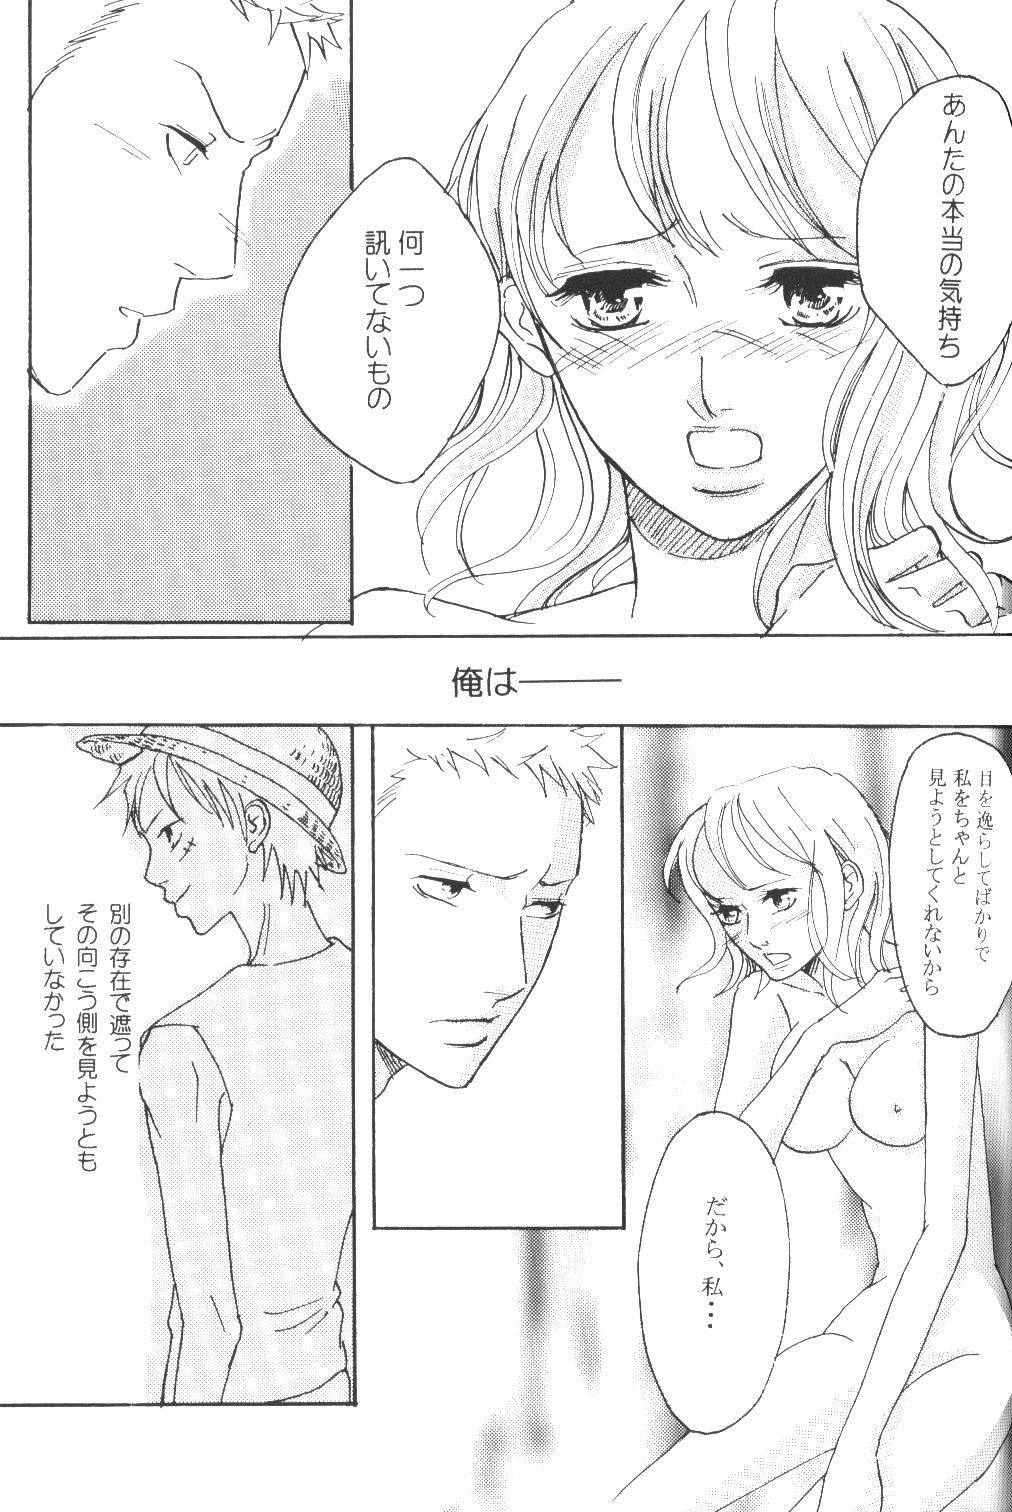 Yume Ichiya 2 13